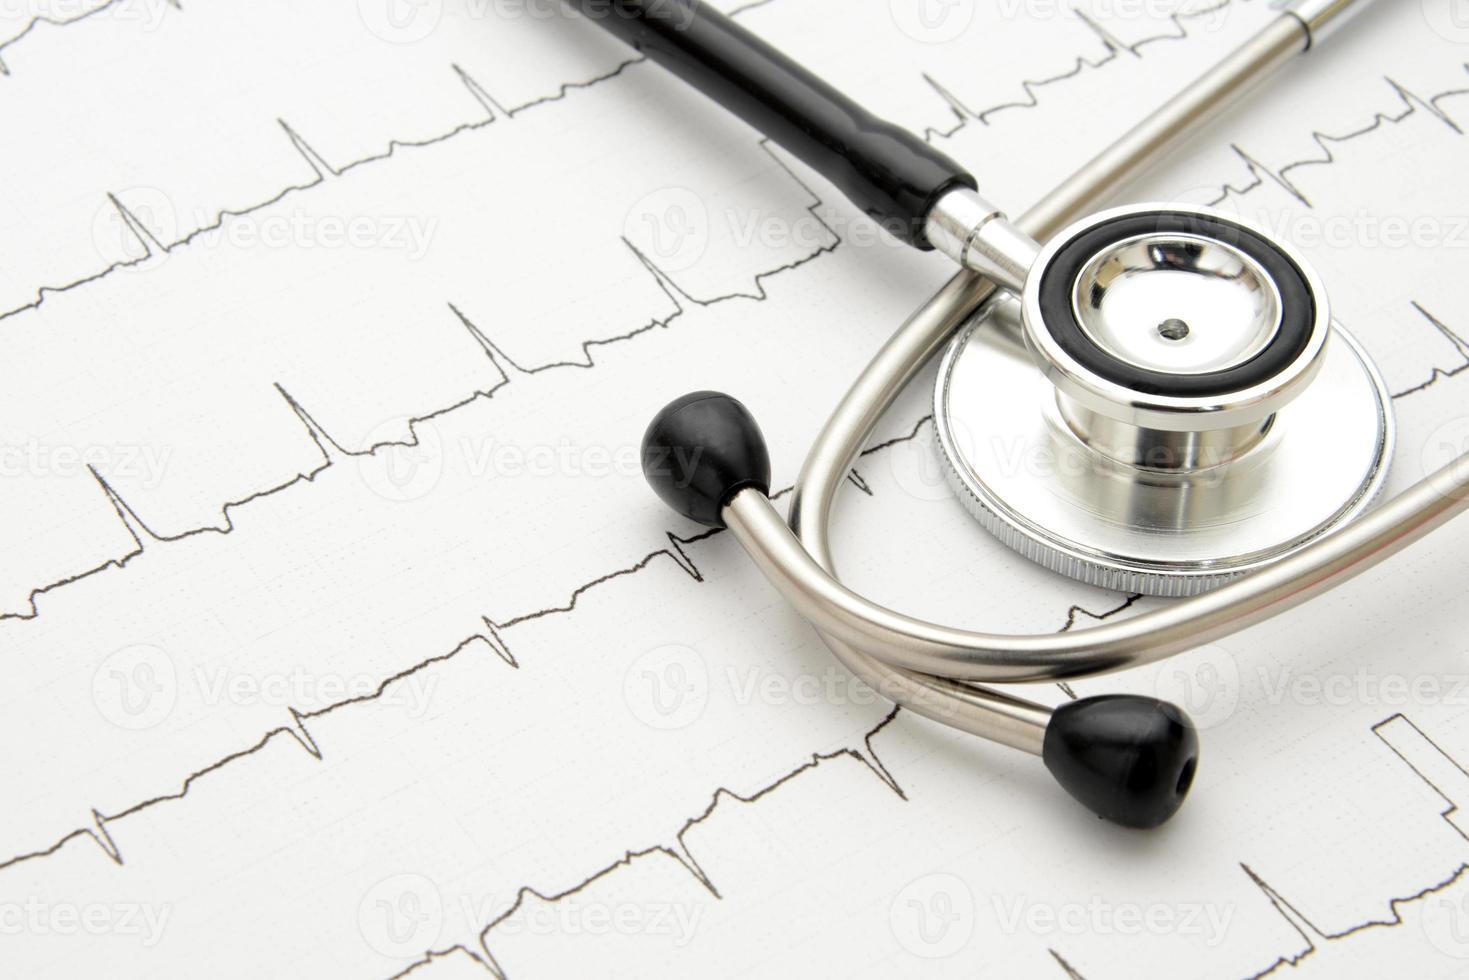 stethoscoop op elektrocardiogram foto